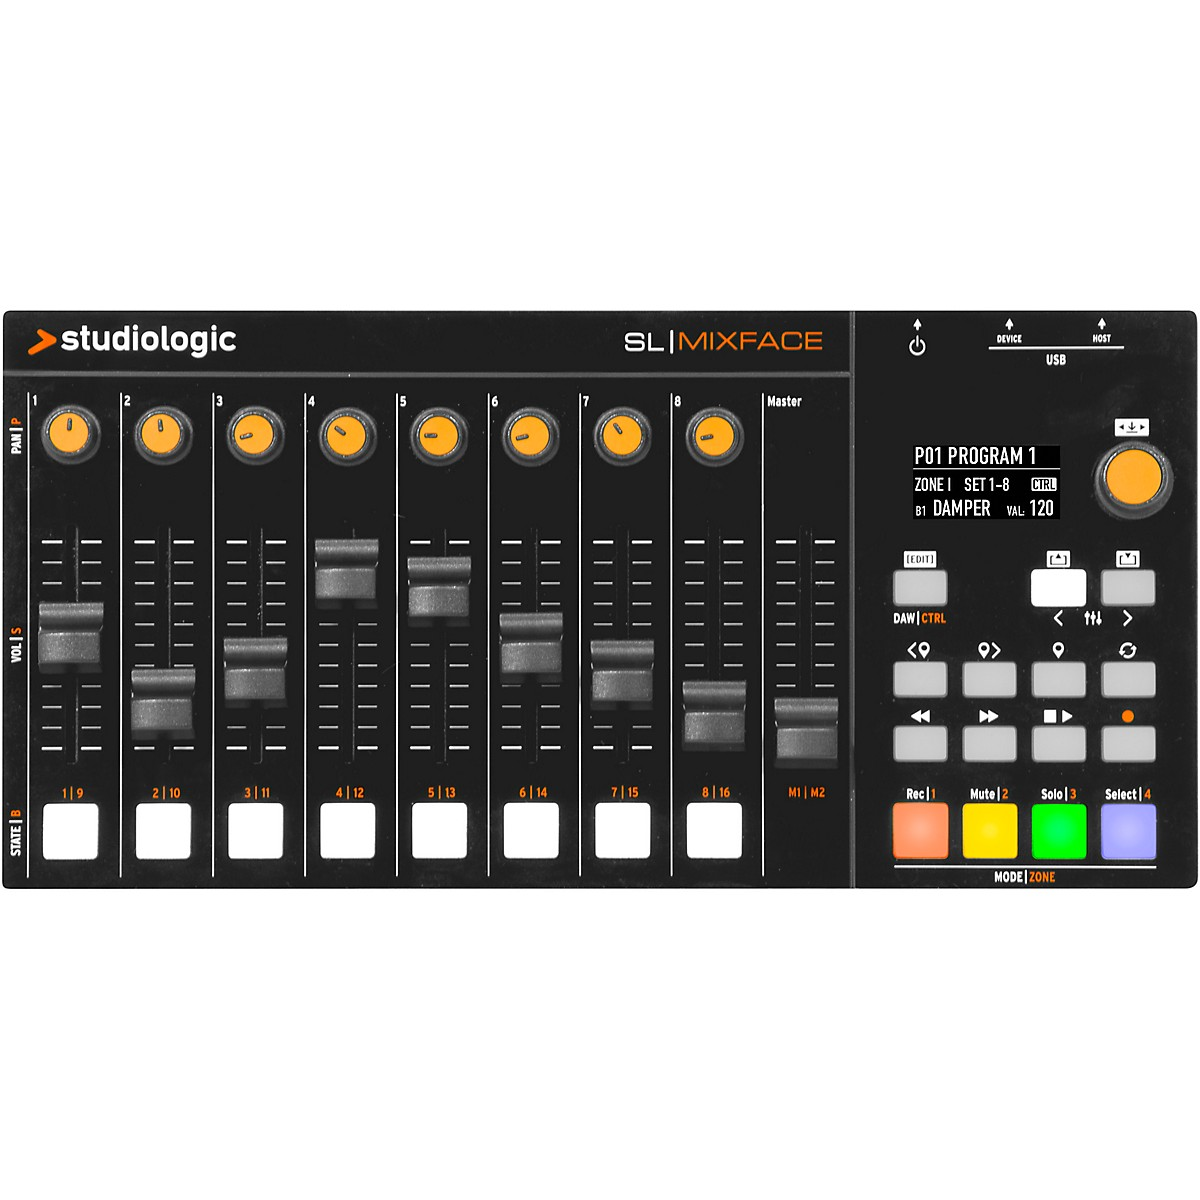 Studiologic Mixface MIDI Control Surface